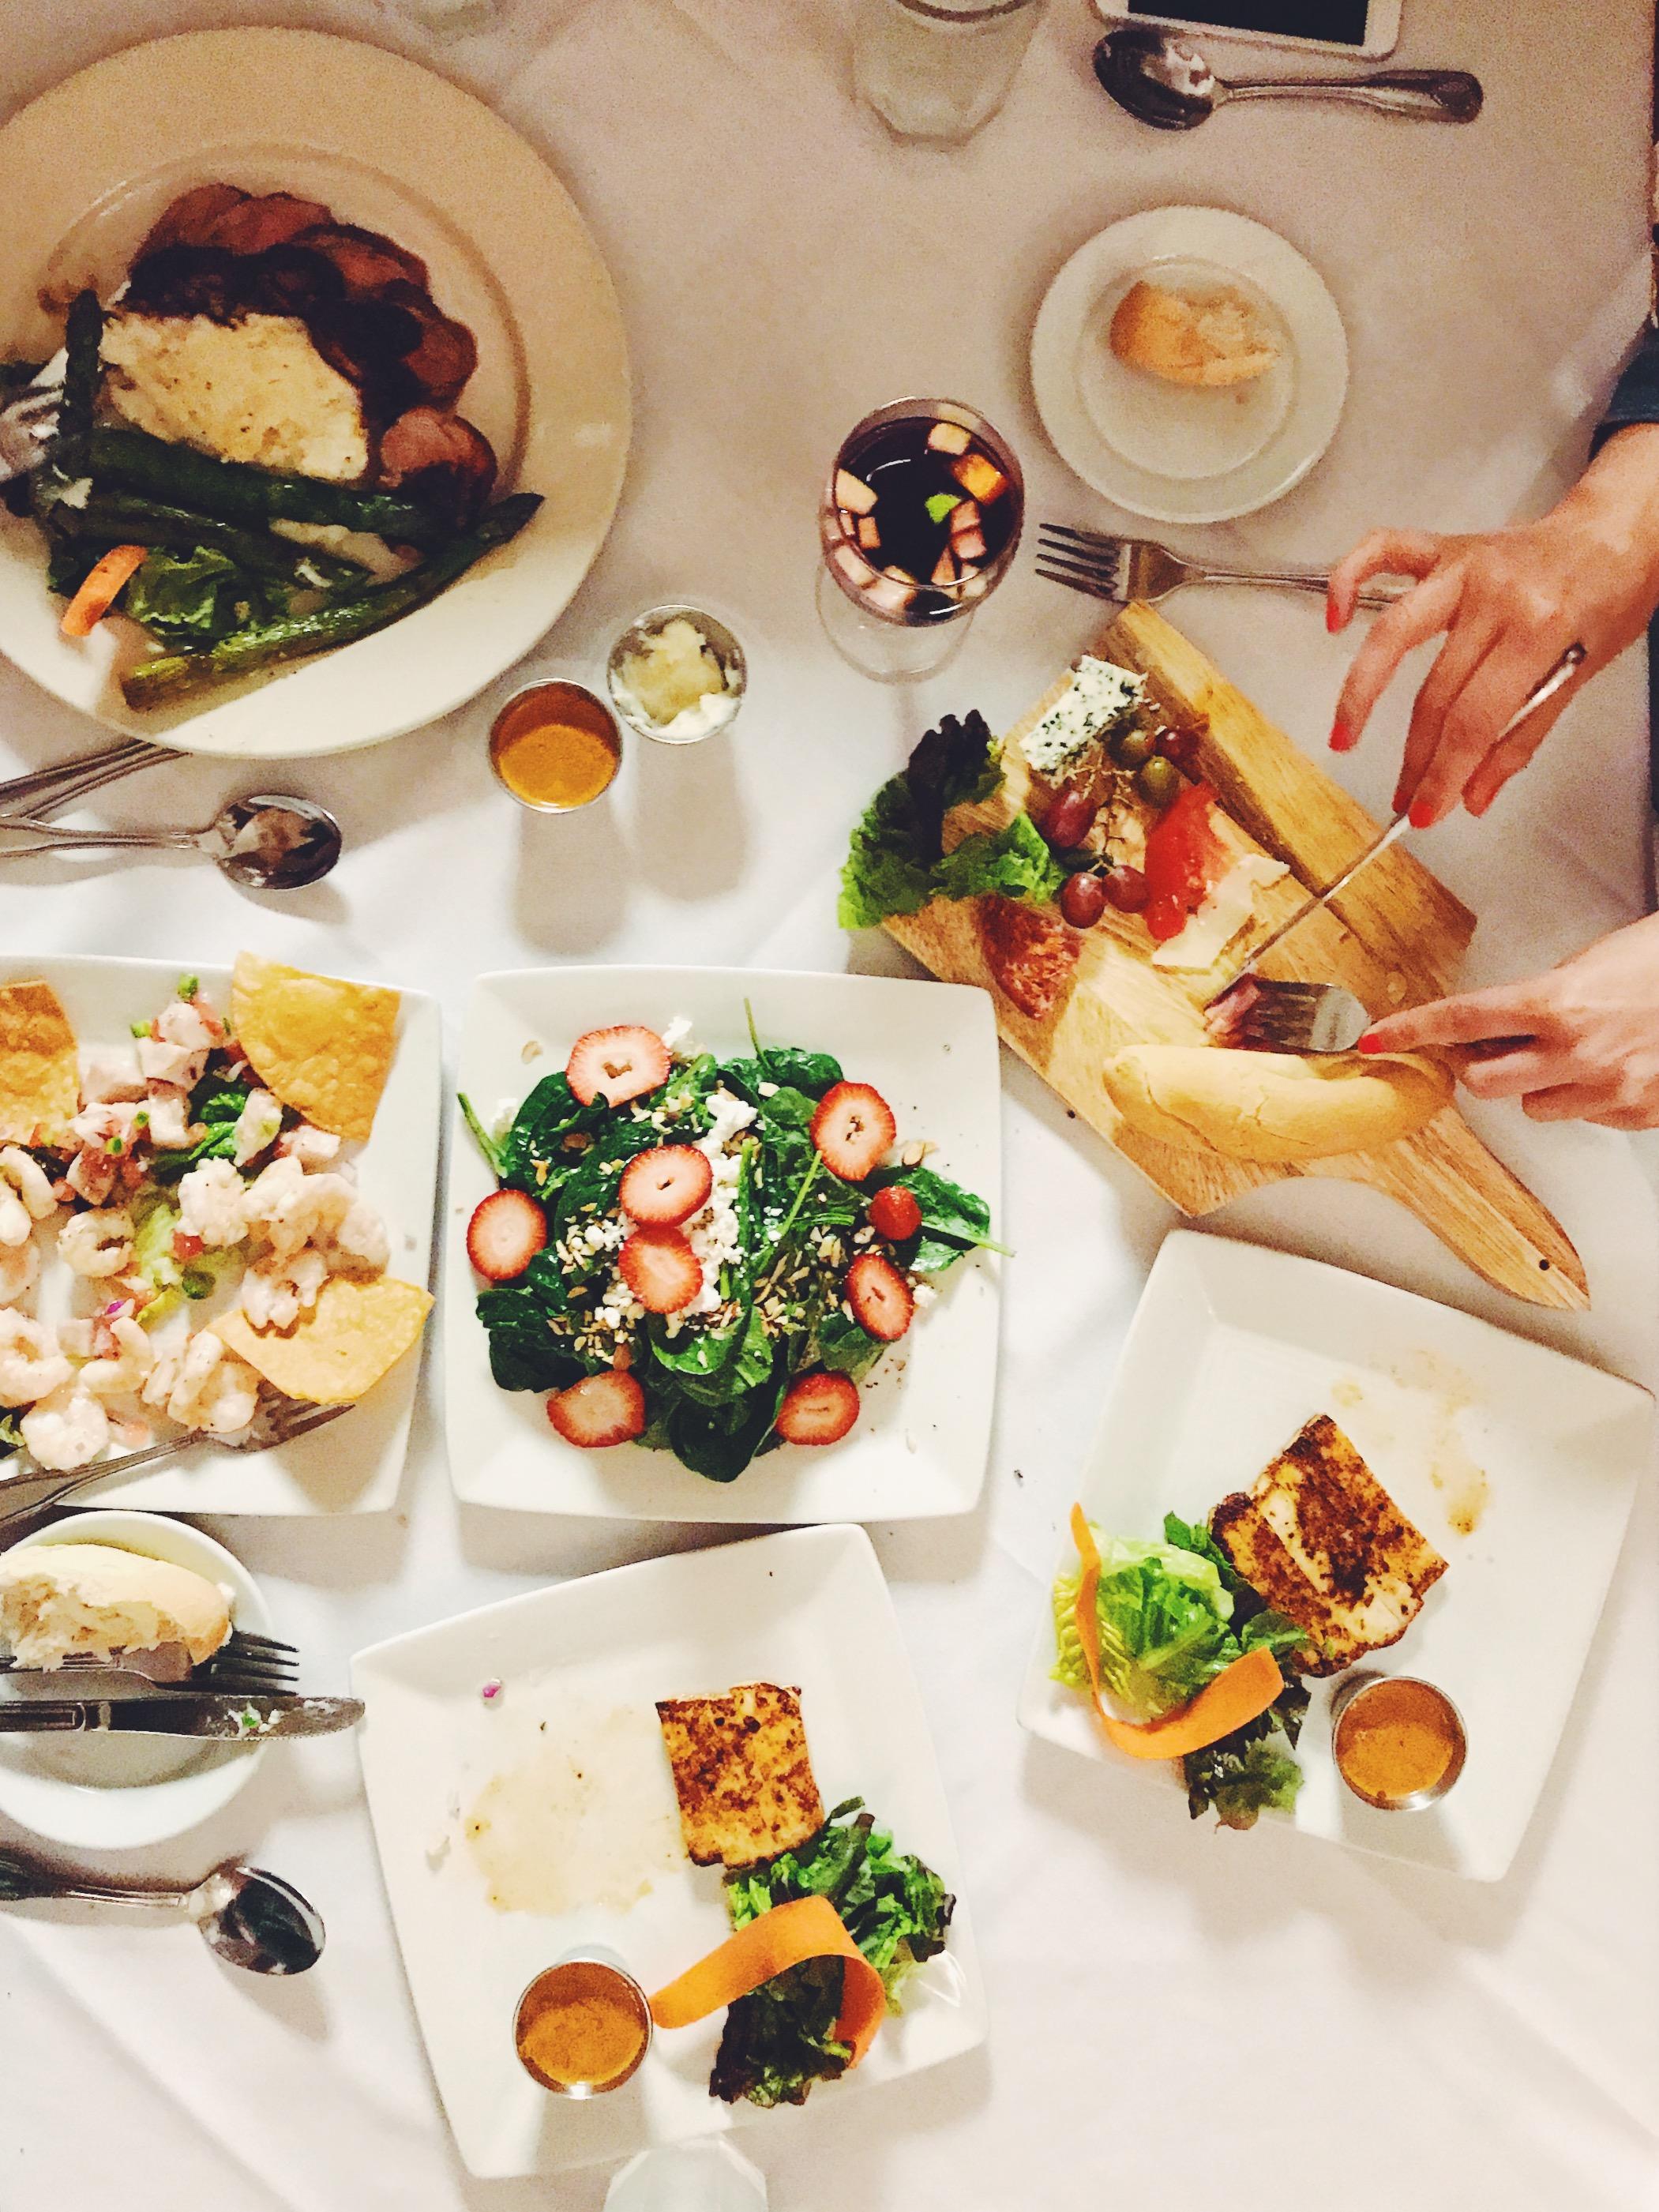 Dinner at Lola's restaurant after New Orleans Jazz Festival